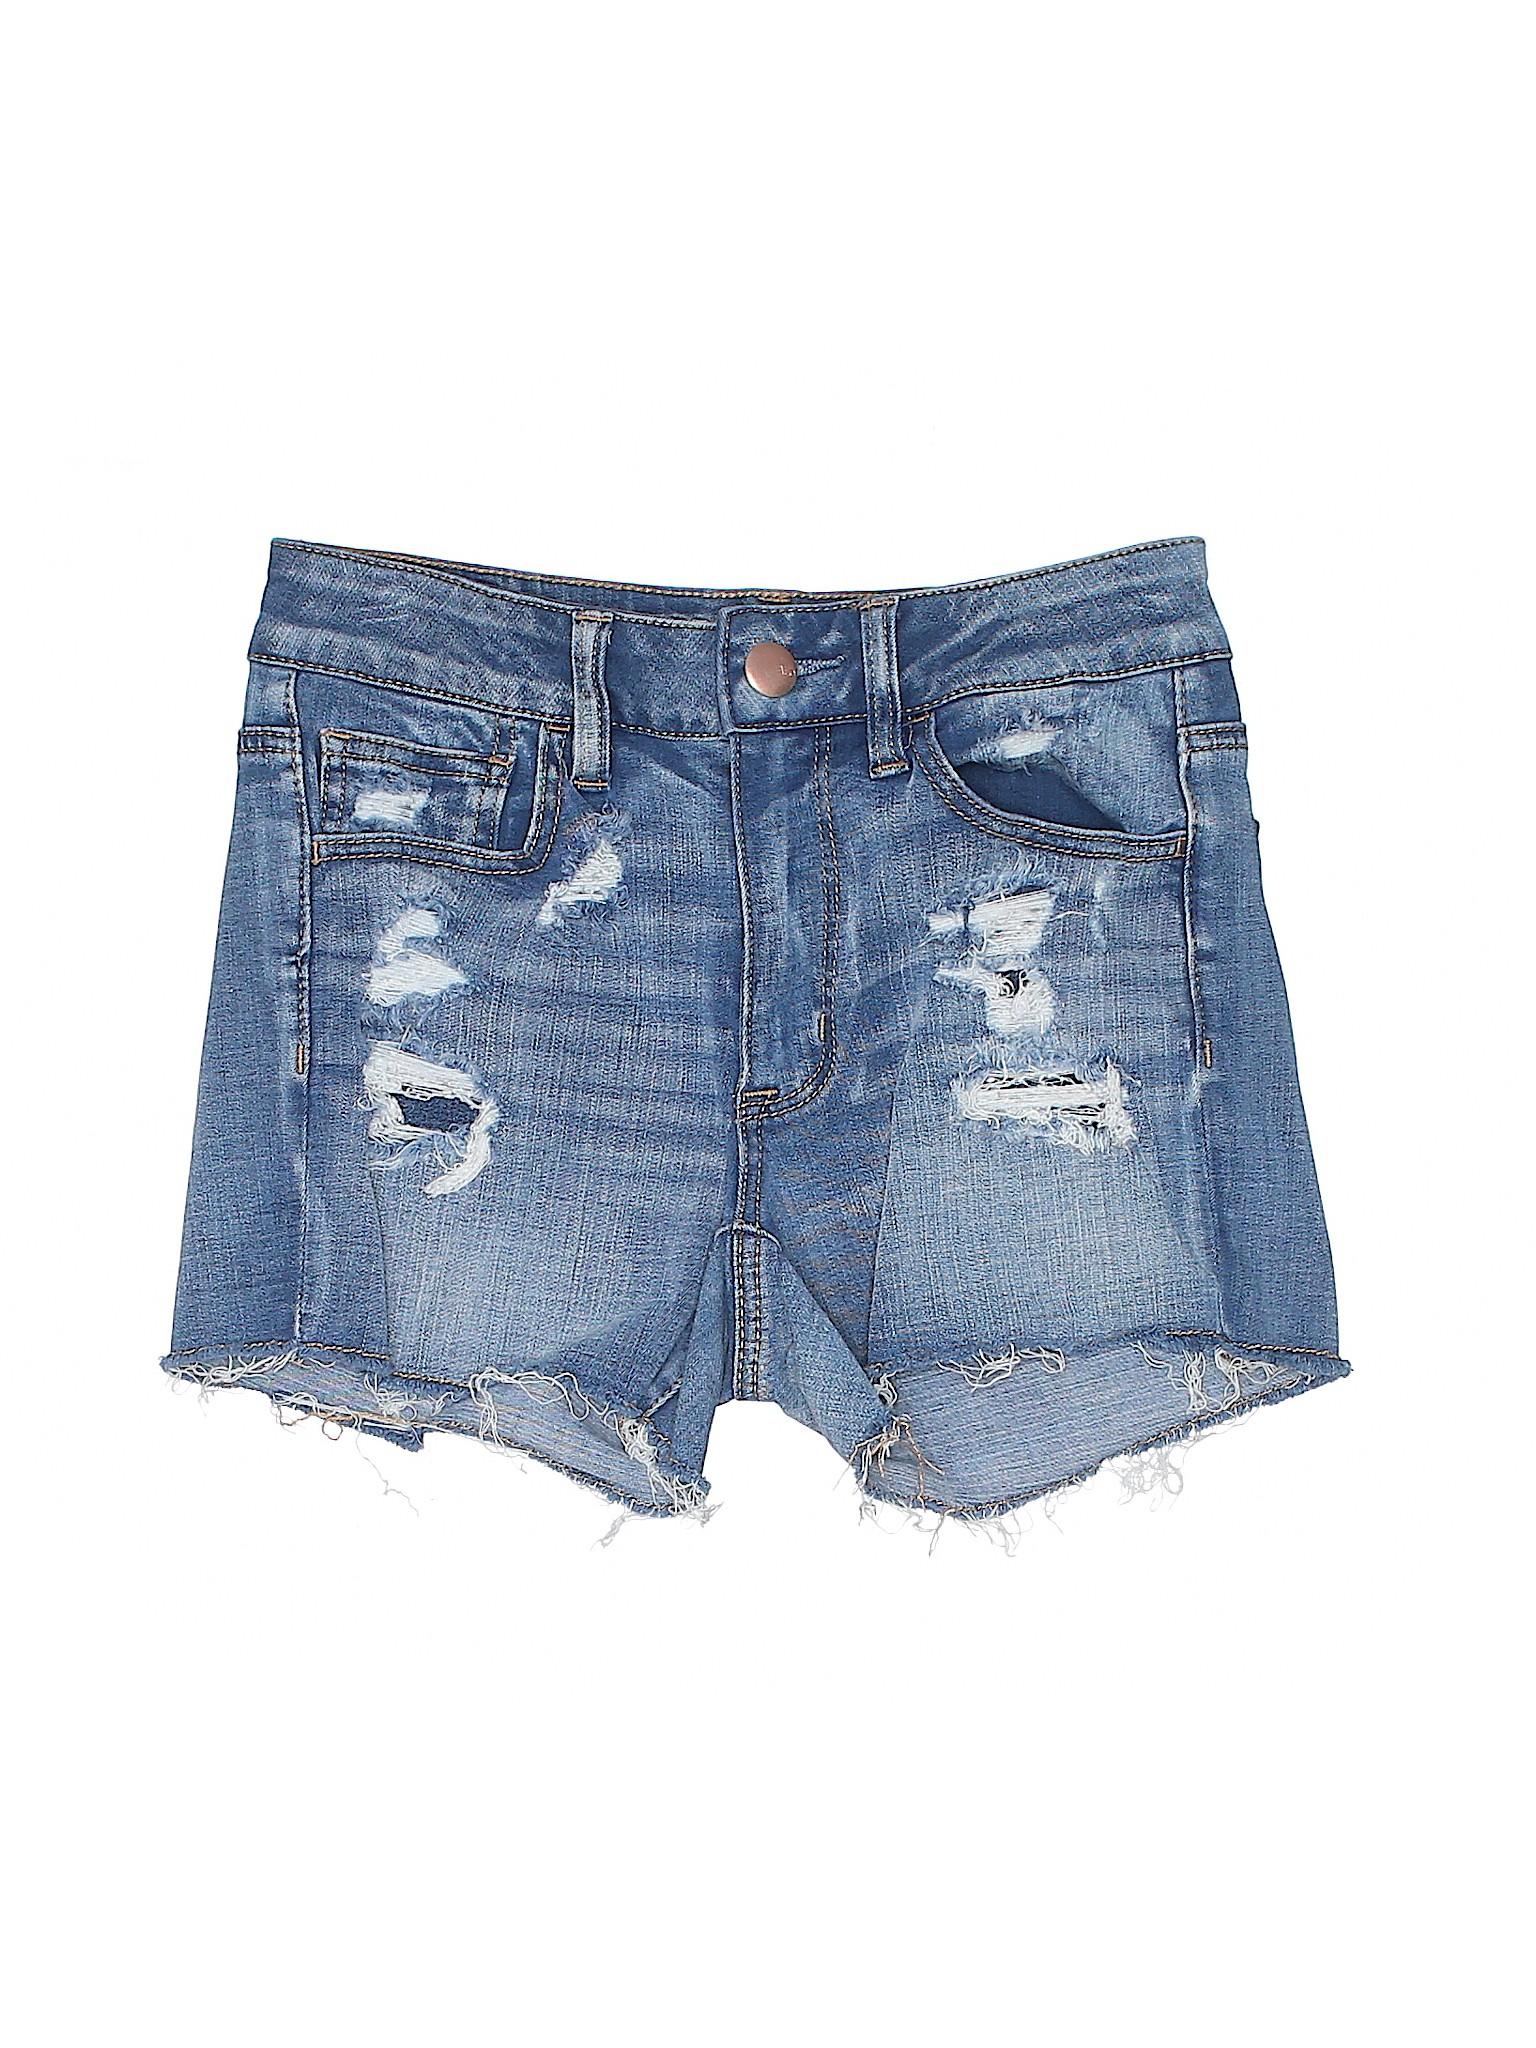 Shorts Denim Eagle Boutique American Outfitters leisure 6qxCXaUw4